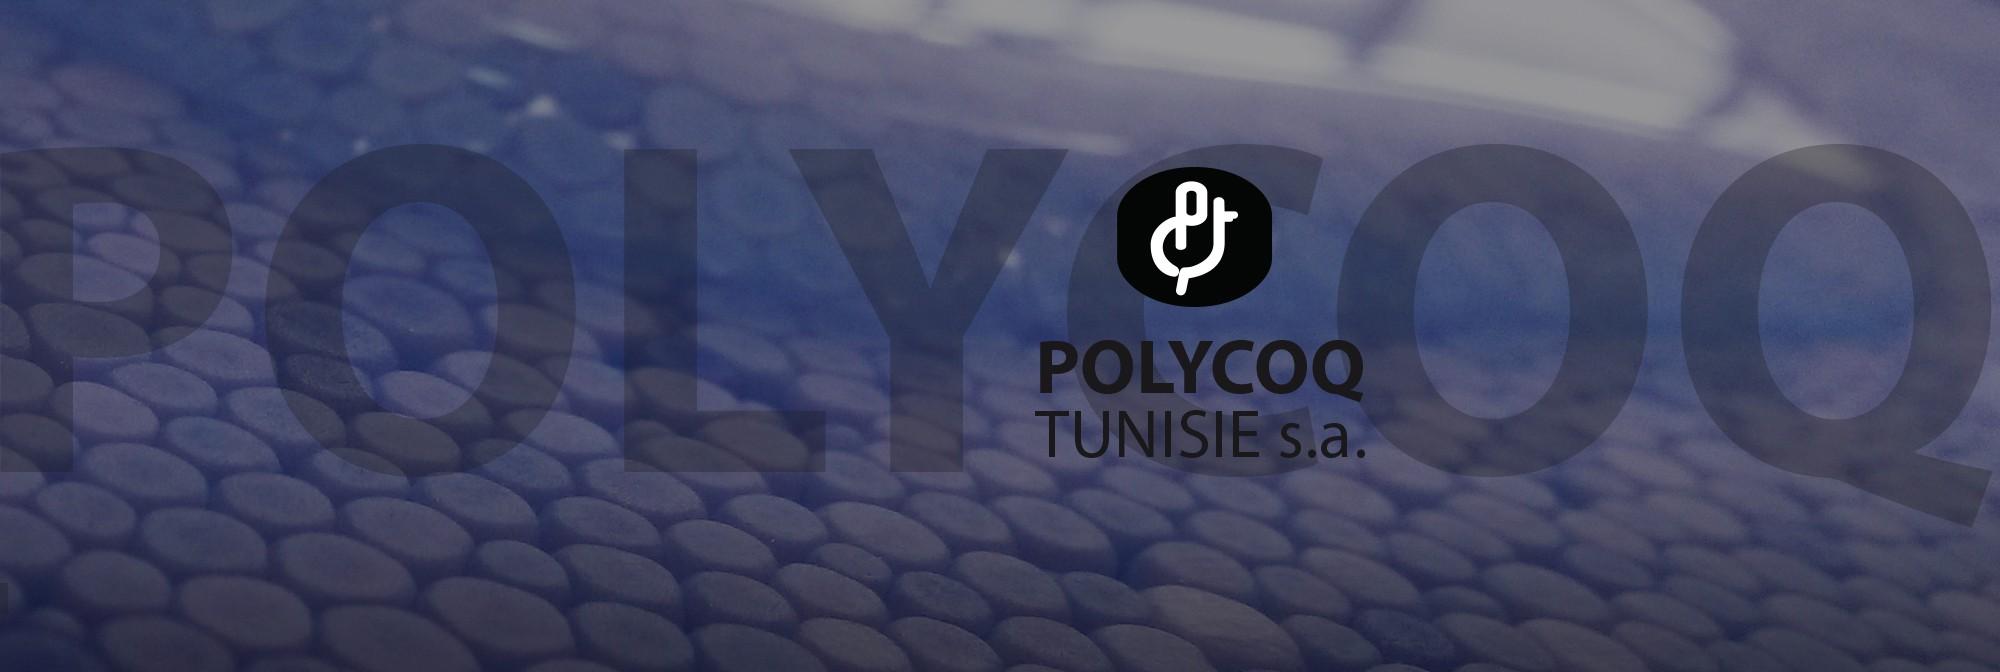 polycoq